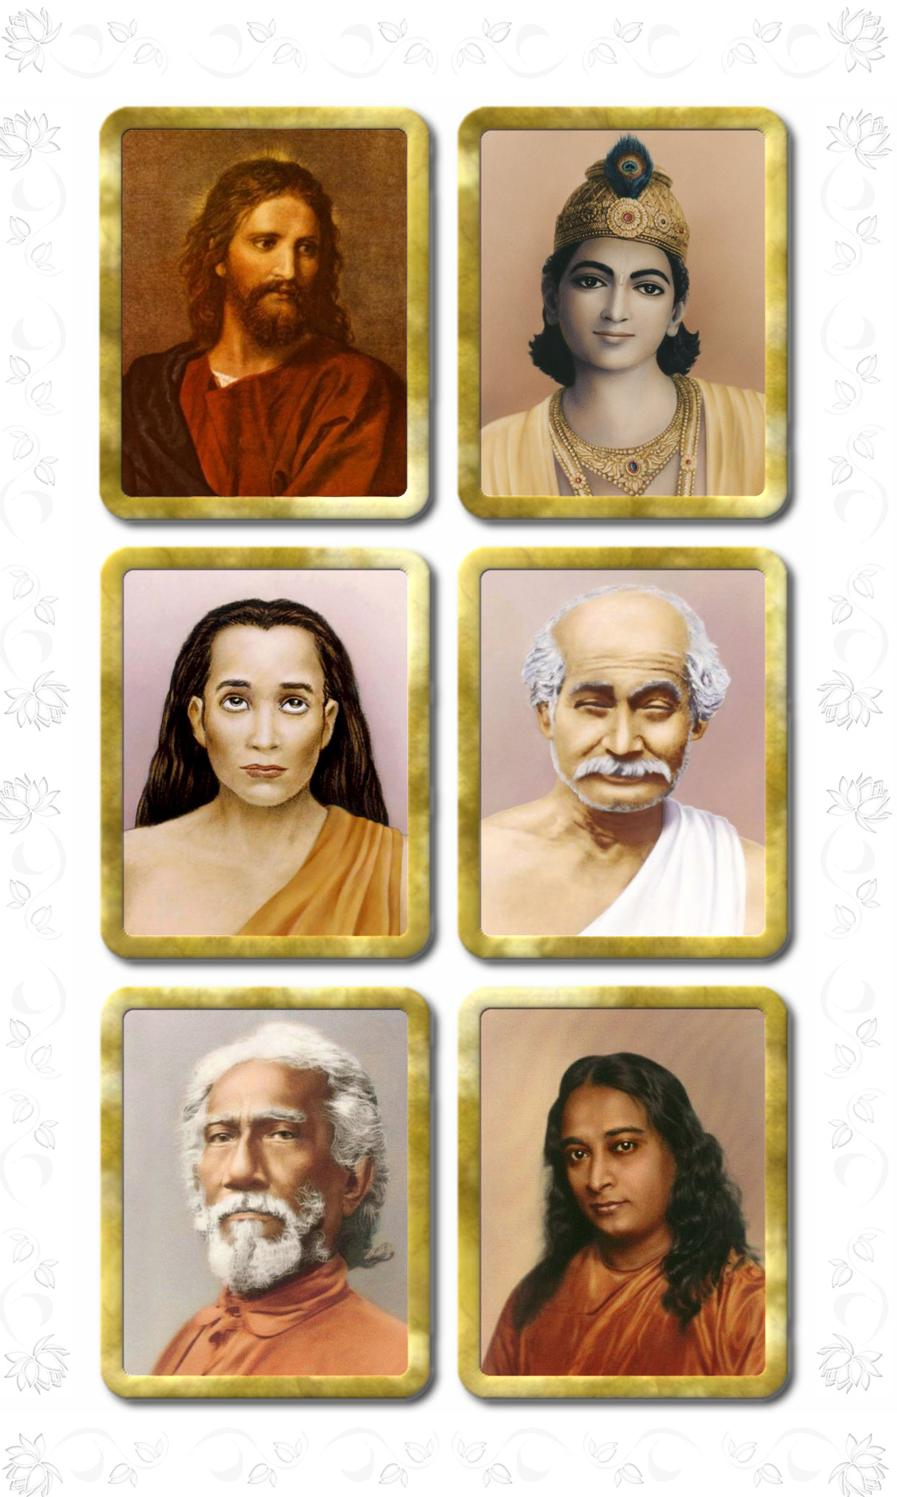 Gurus of the Self-Realization Fellowship